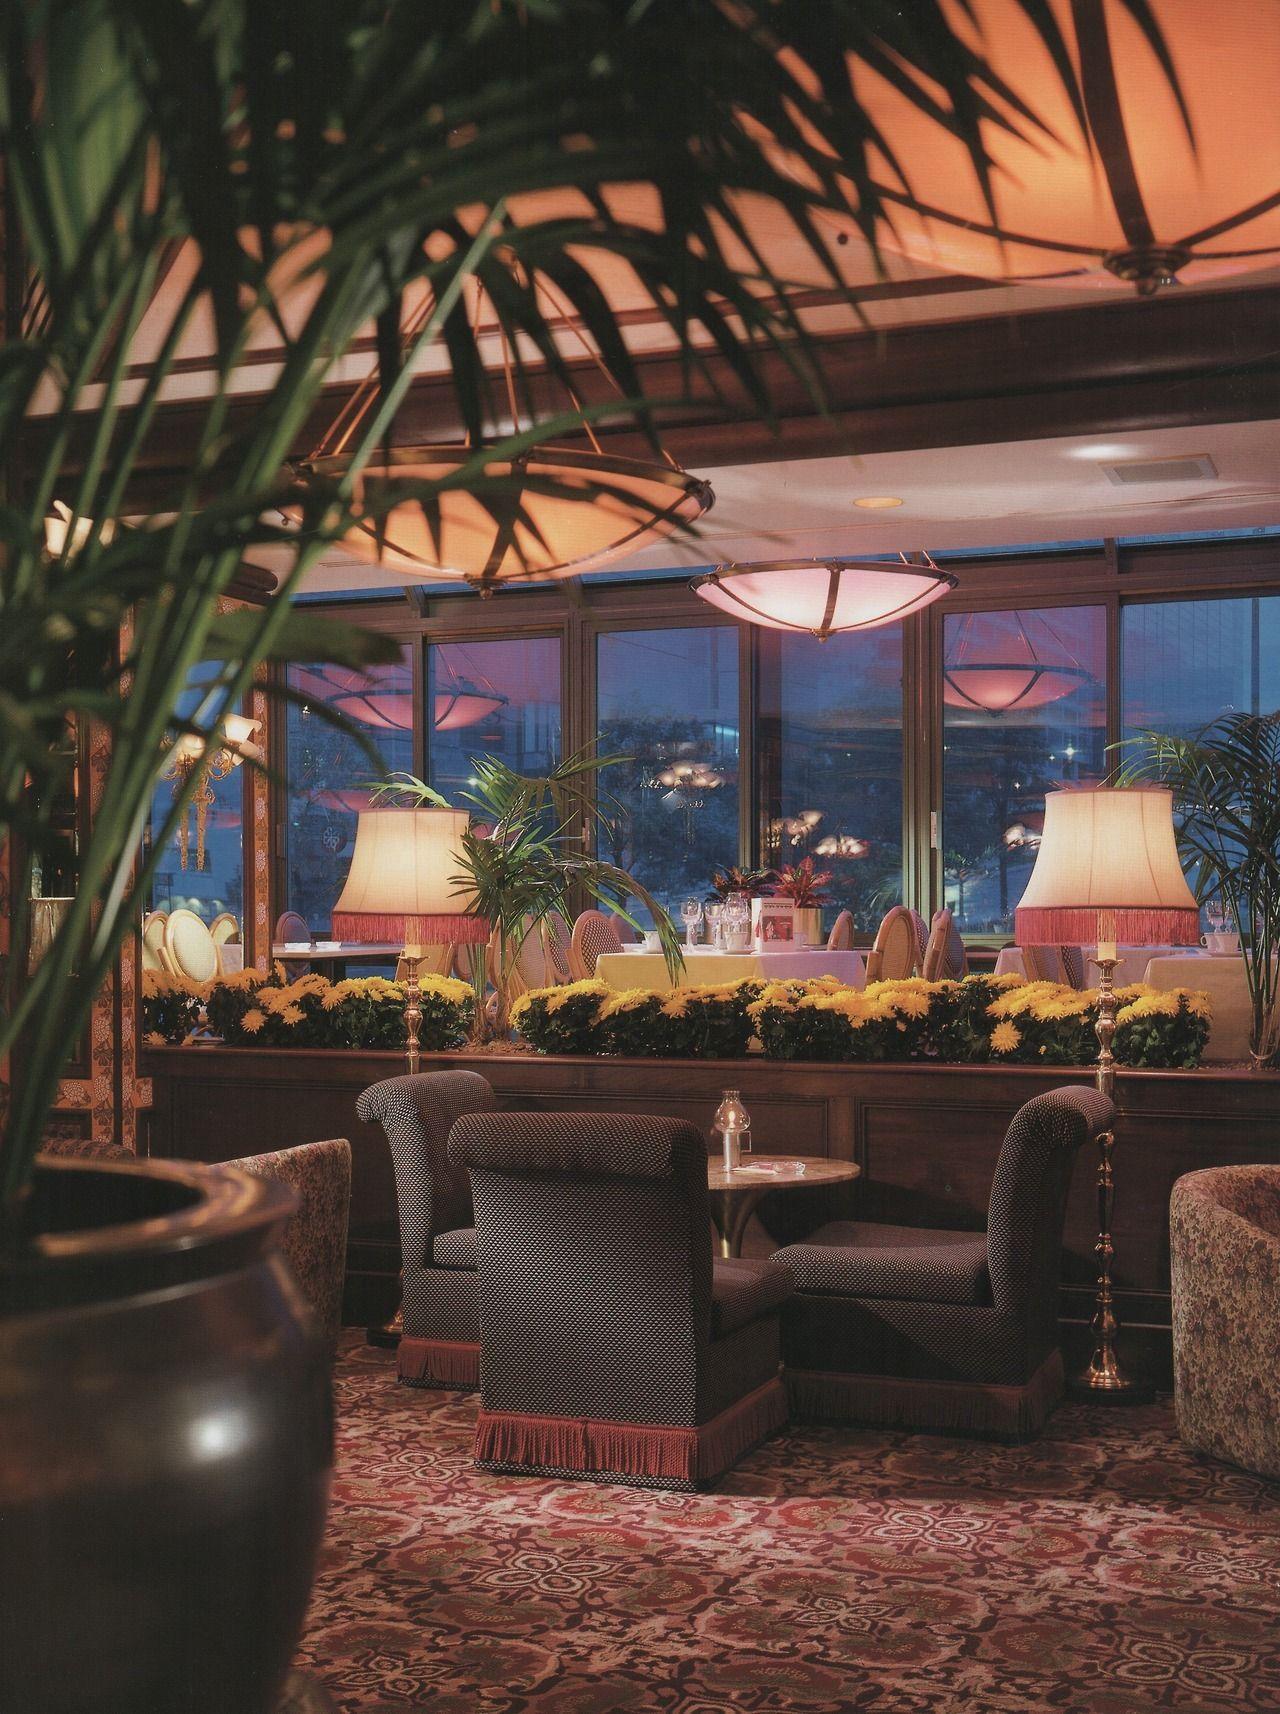 Chez Antoine Montreal Canada From Restaurant Design 1987 Vintage Interior Decor Restaurant Design Trending Decor